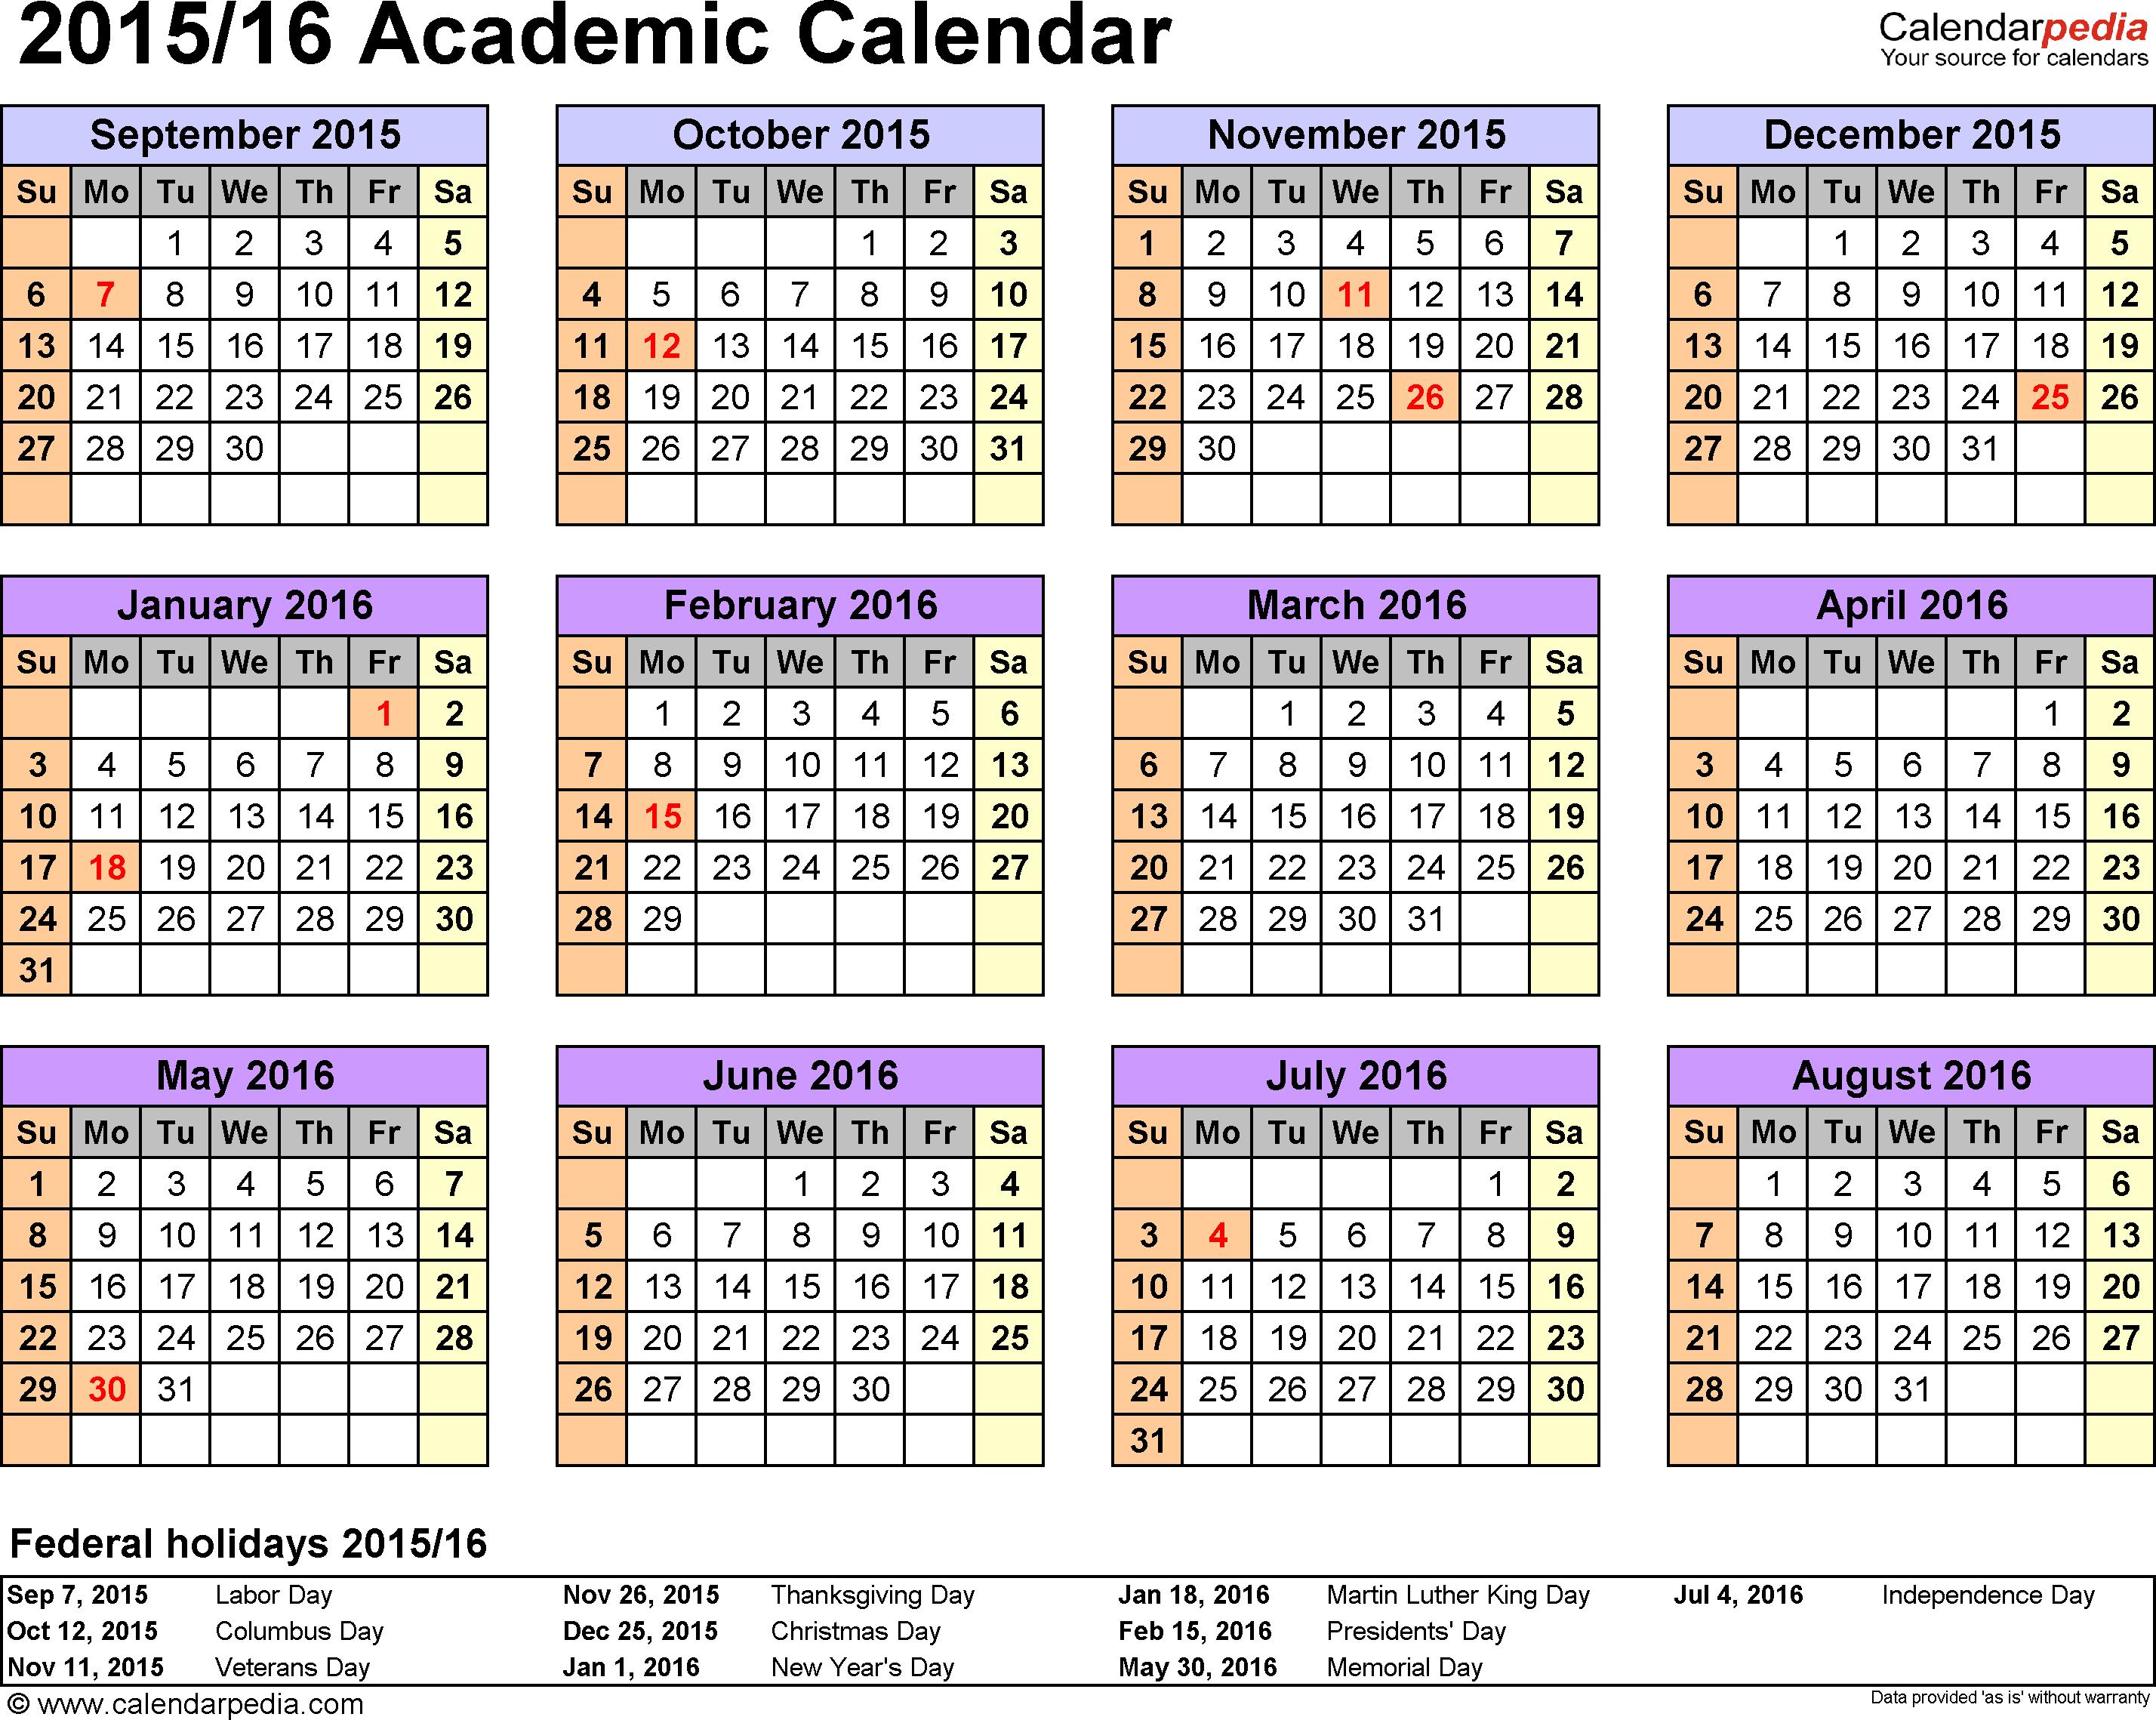 Academic Calendar 2015 2016